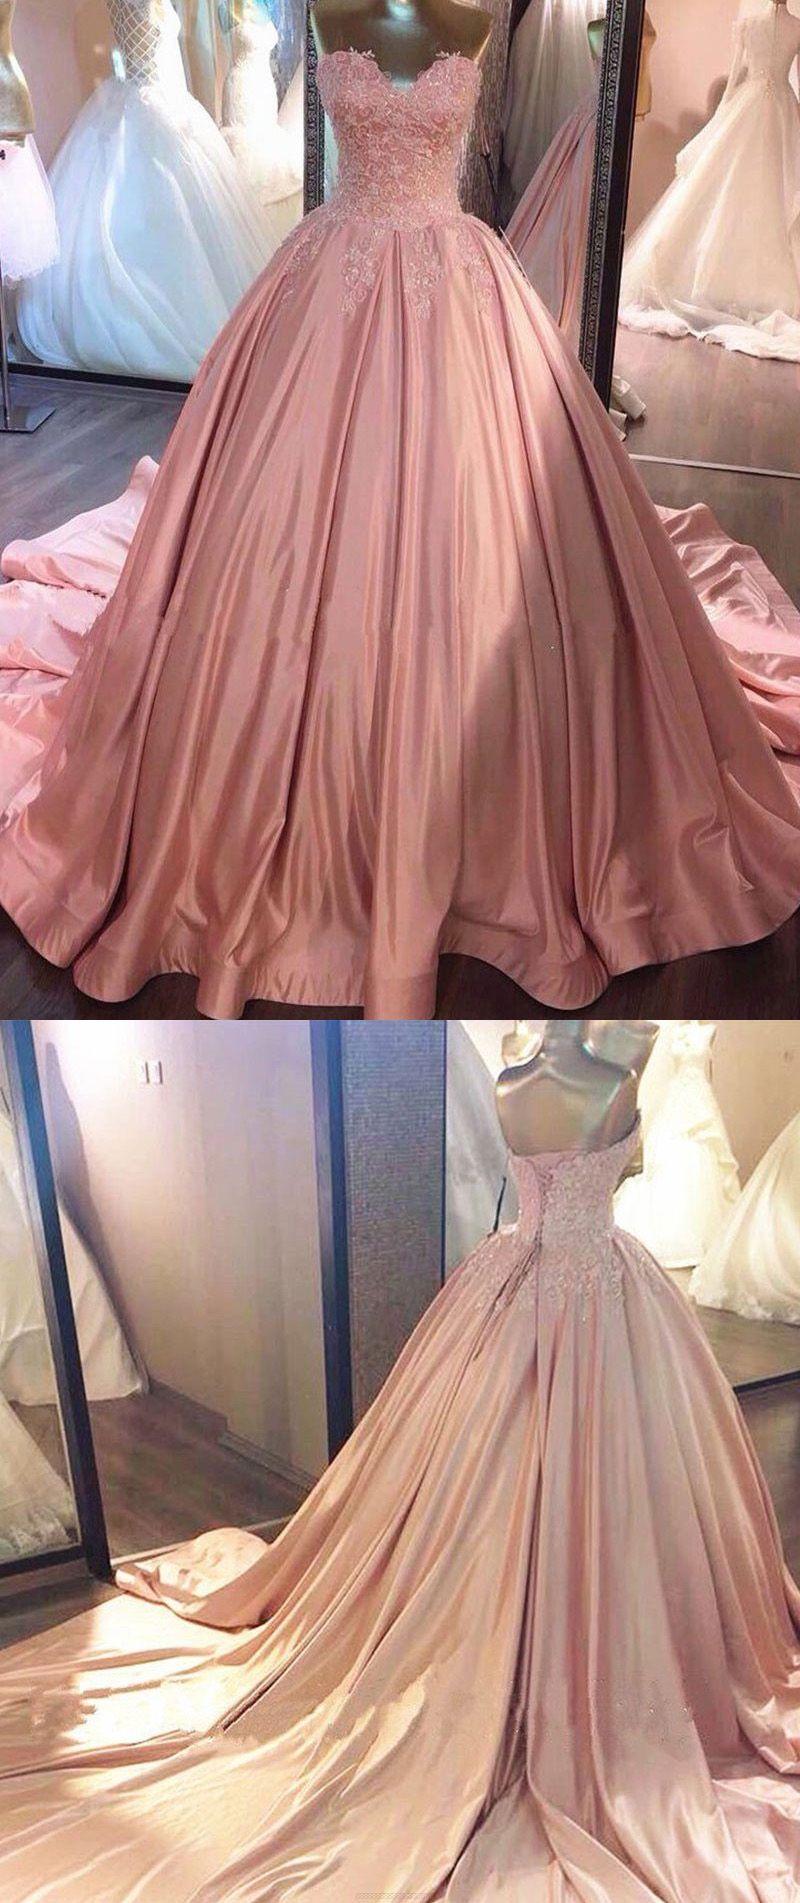 Applique evening dresses pink ball gown evening dresses long pink